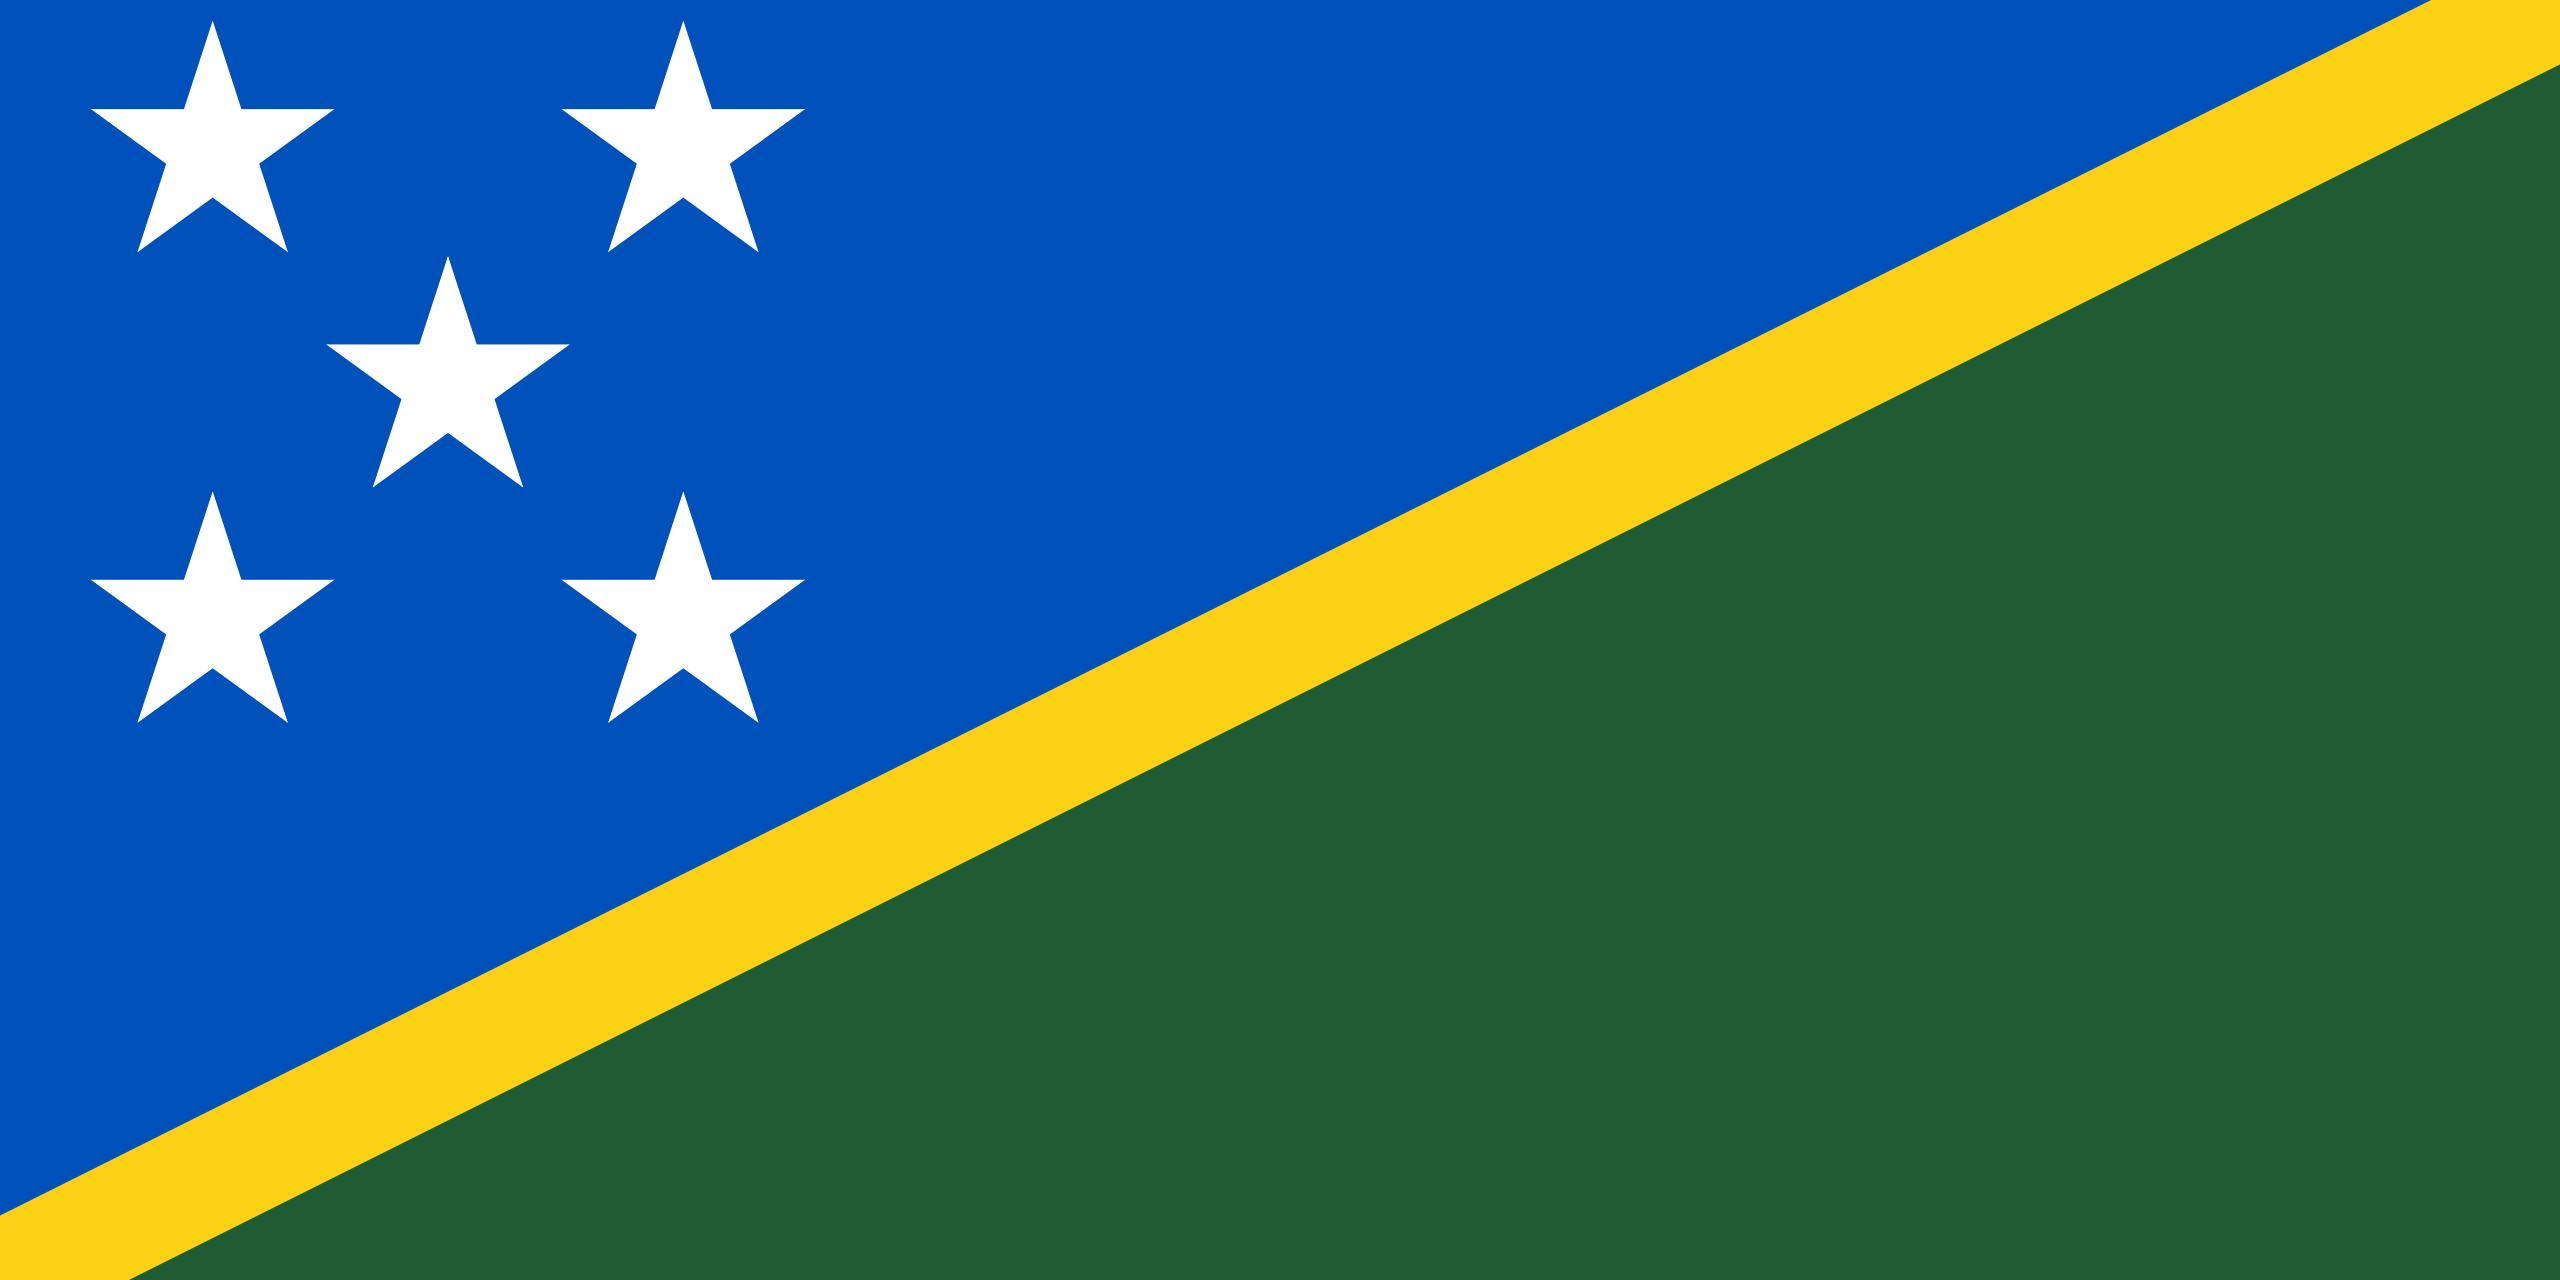 islas salomón, 国, エンブレム, ロゴ, シンボル - HD の壁紙 - 教授-falken.com